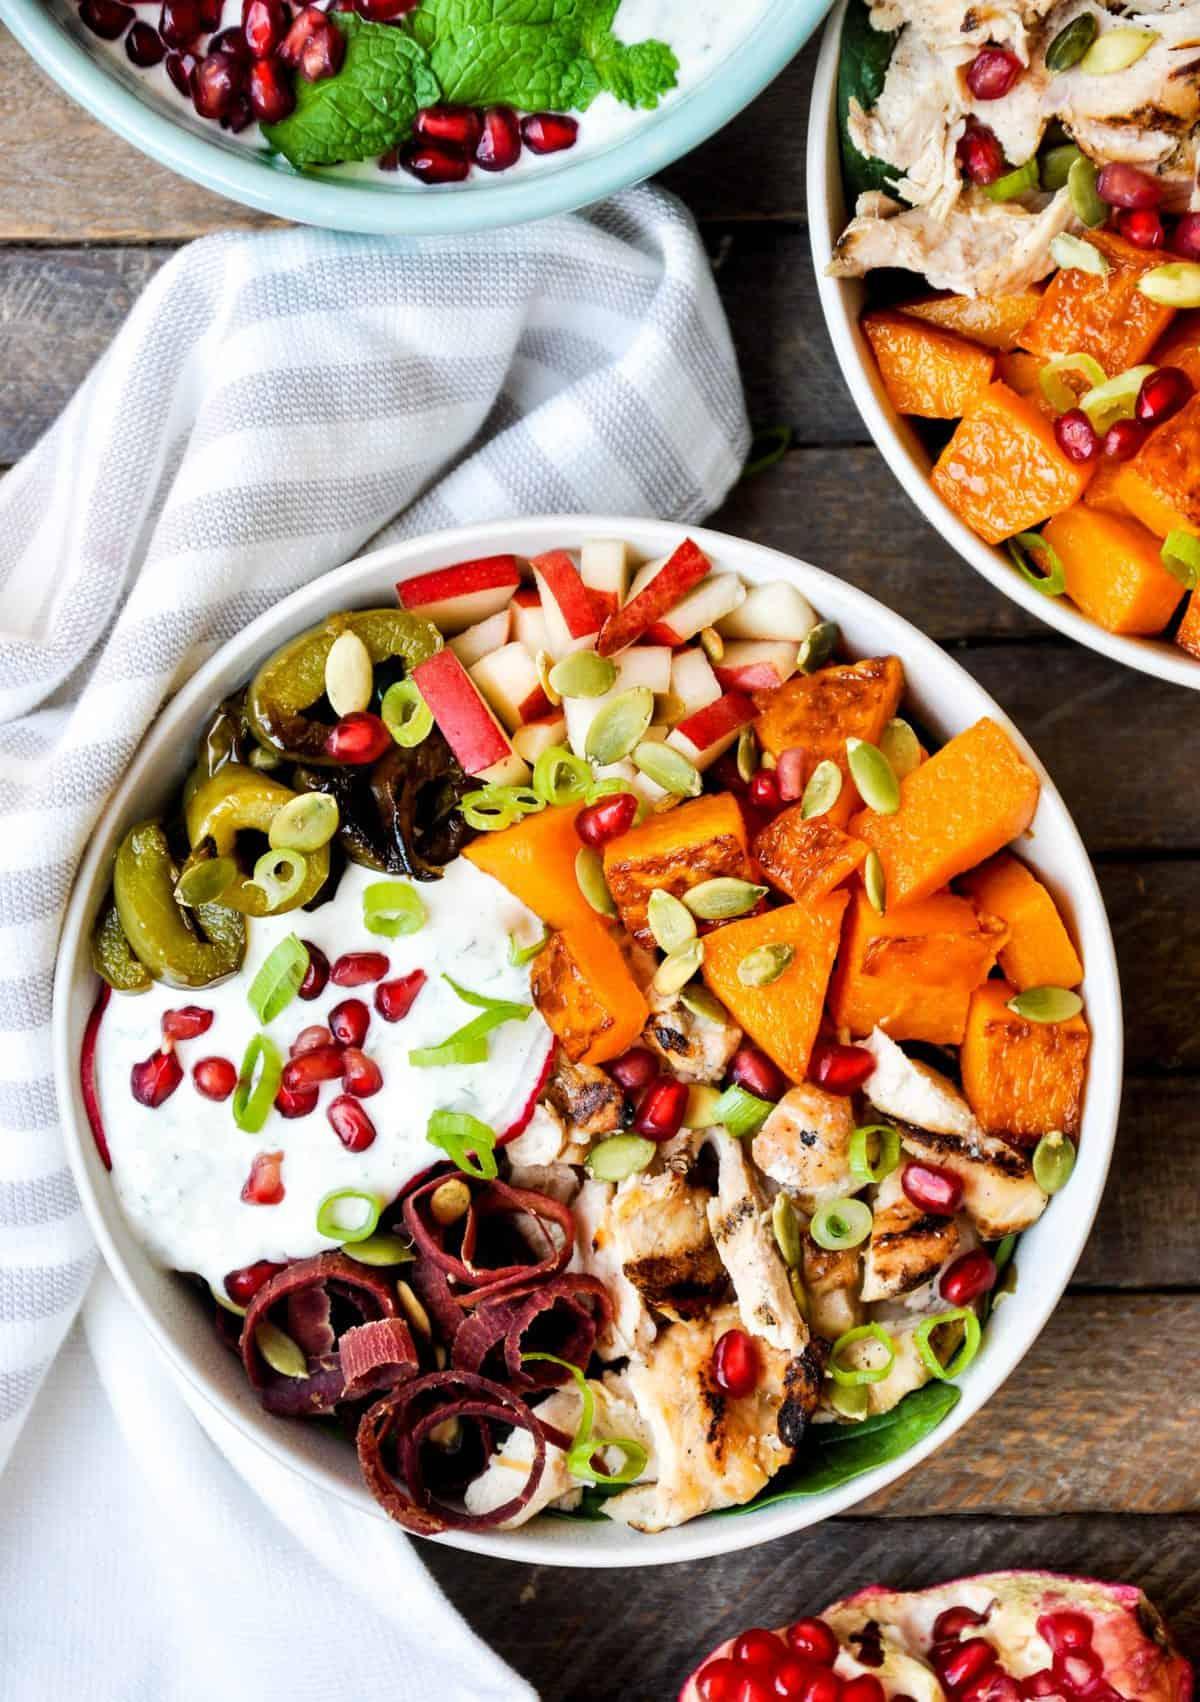 Delicious Fall Harvest Bowl Recipe